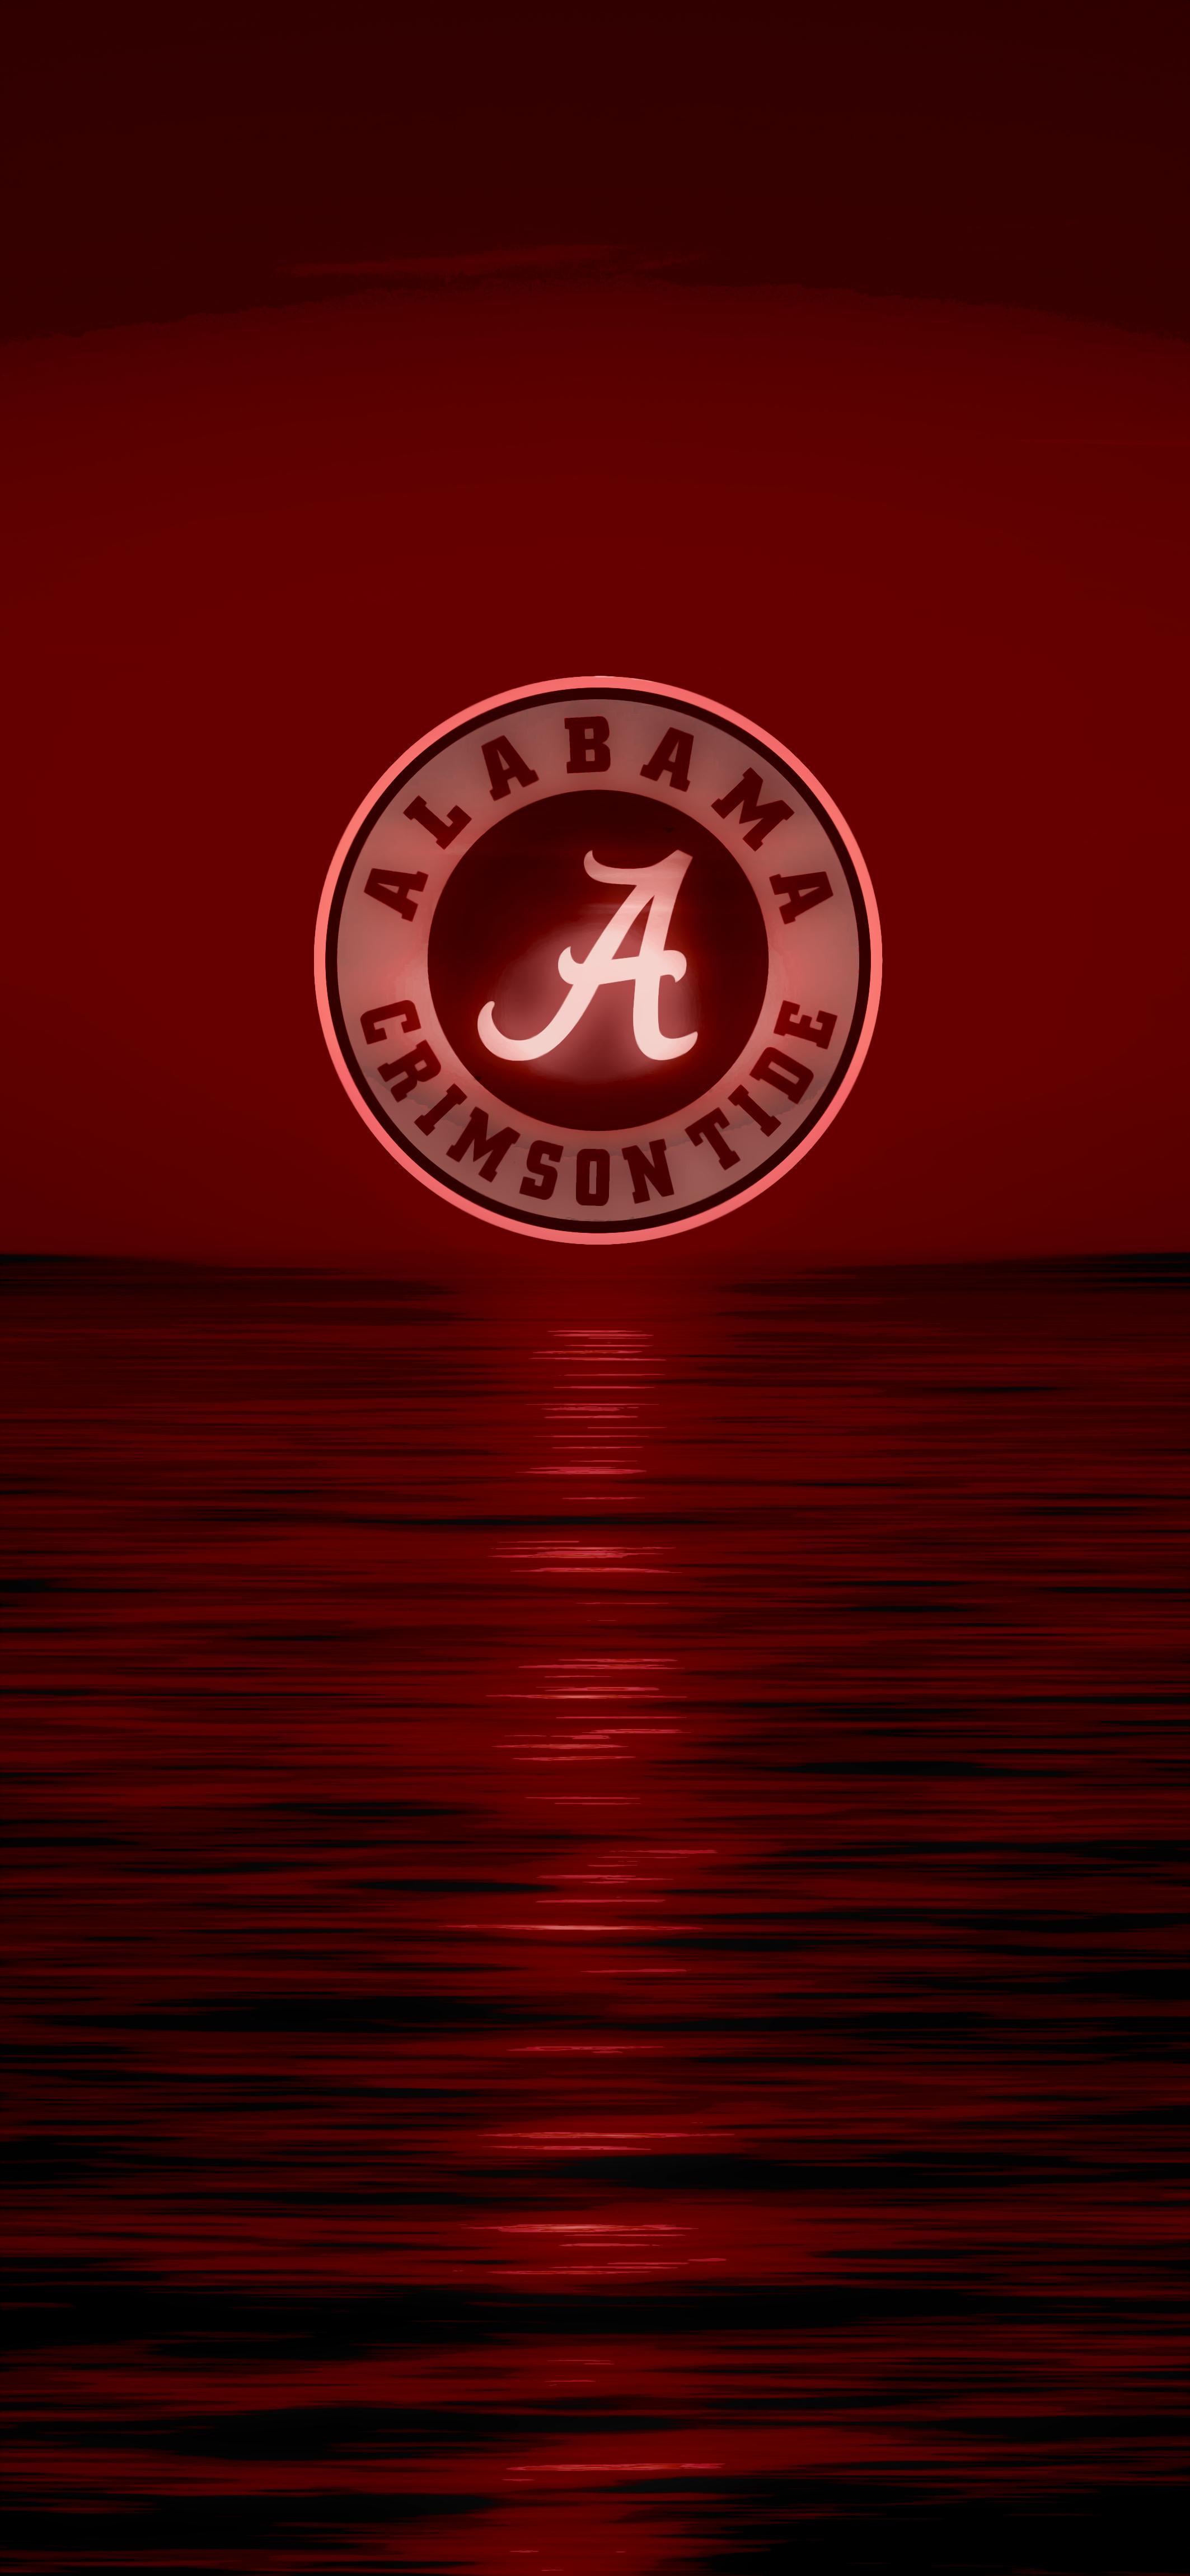 Tide 1 Alabama Crimson Tide Football Wallpaper Alabama Crimson Tide Logo Alabama Football Roll Tide